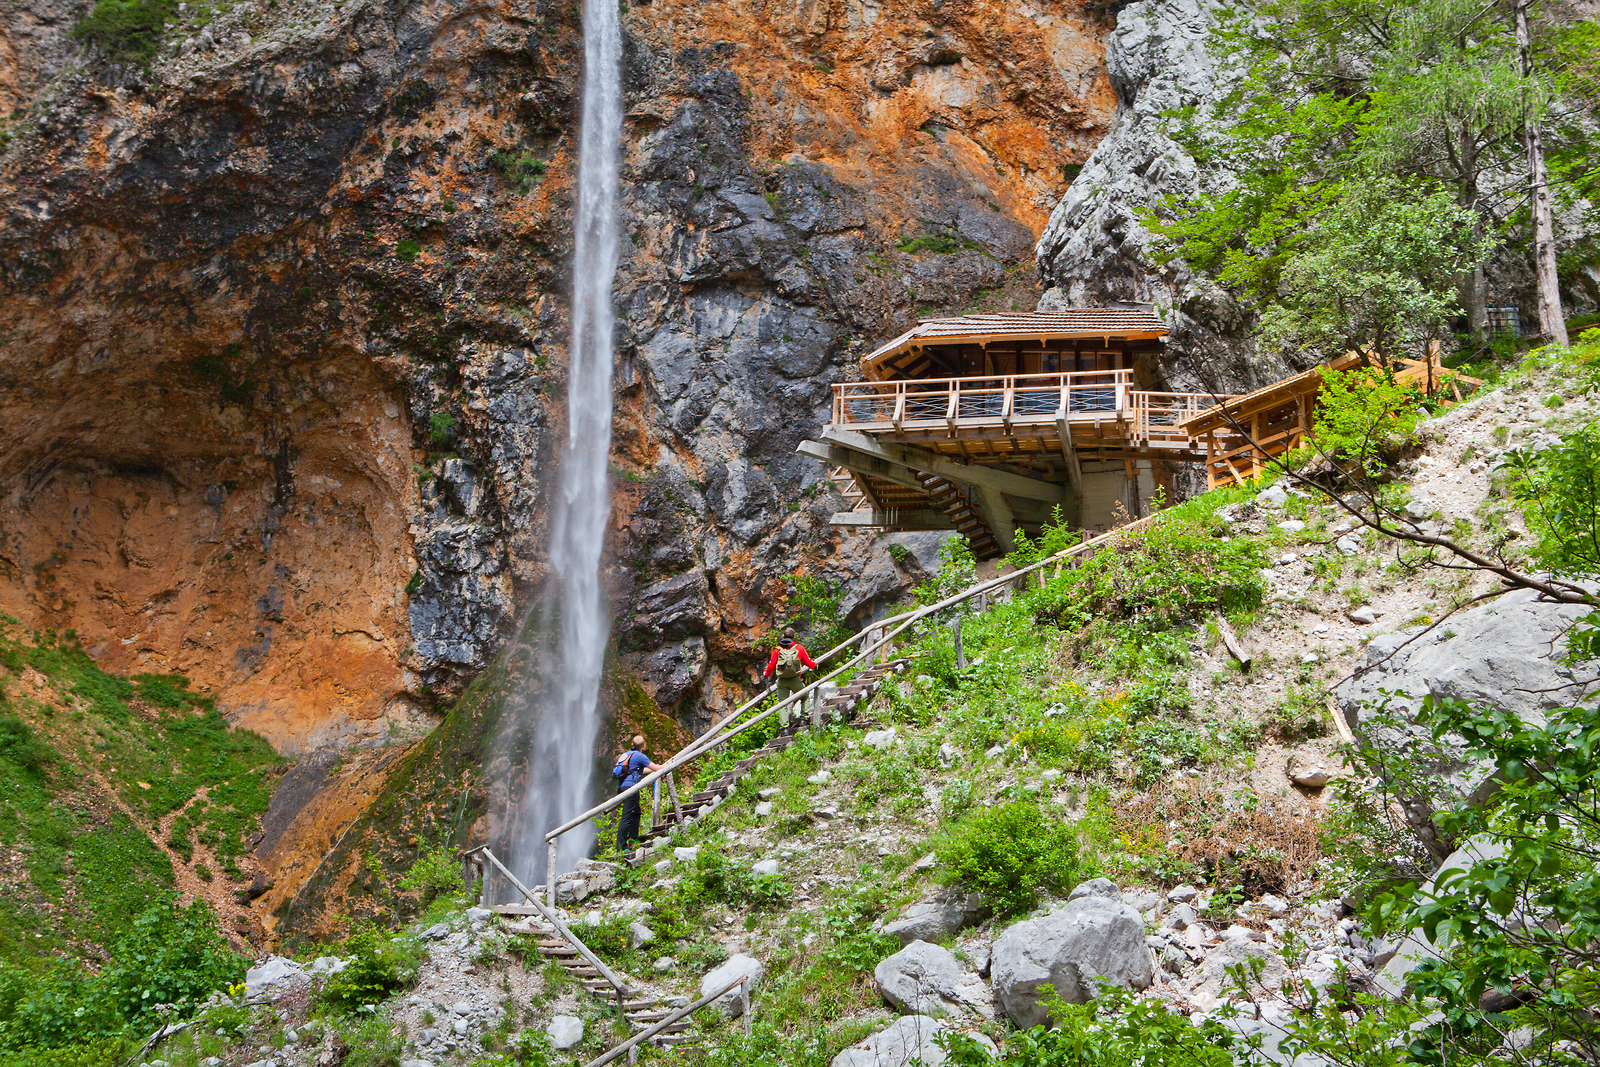 Waterfalls in Slovenia - waterfall Rinka